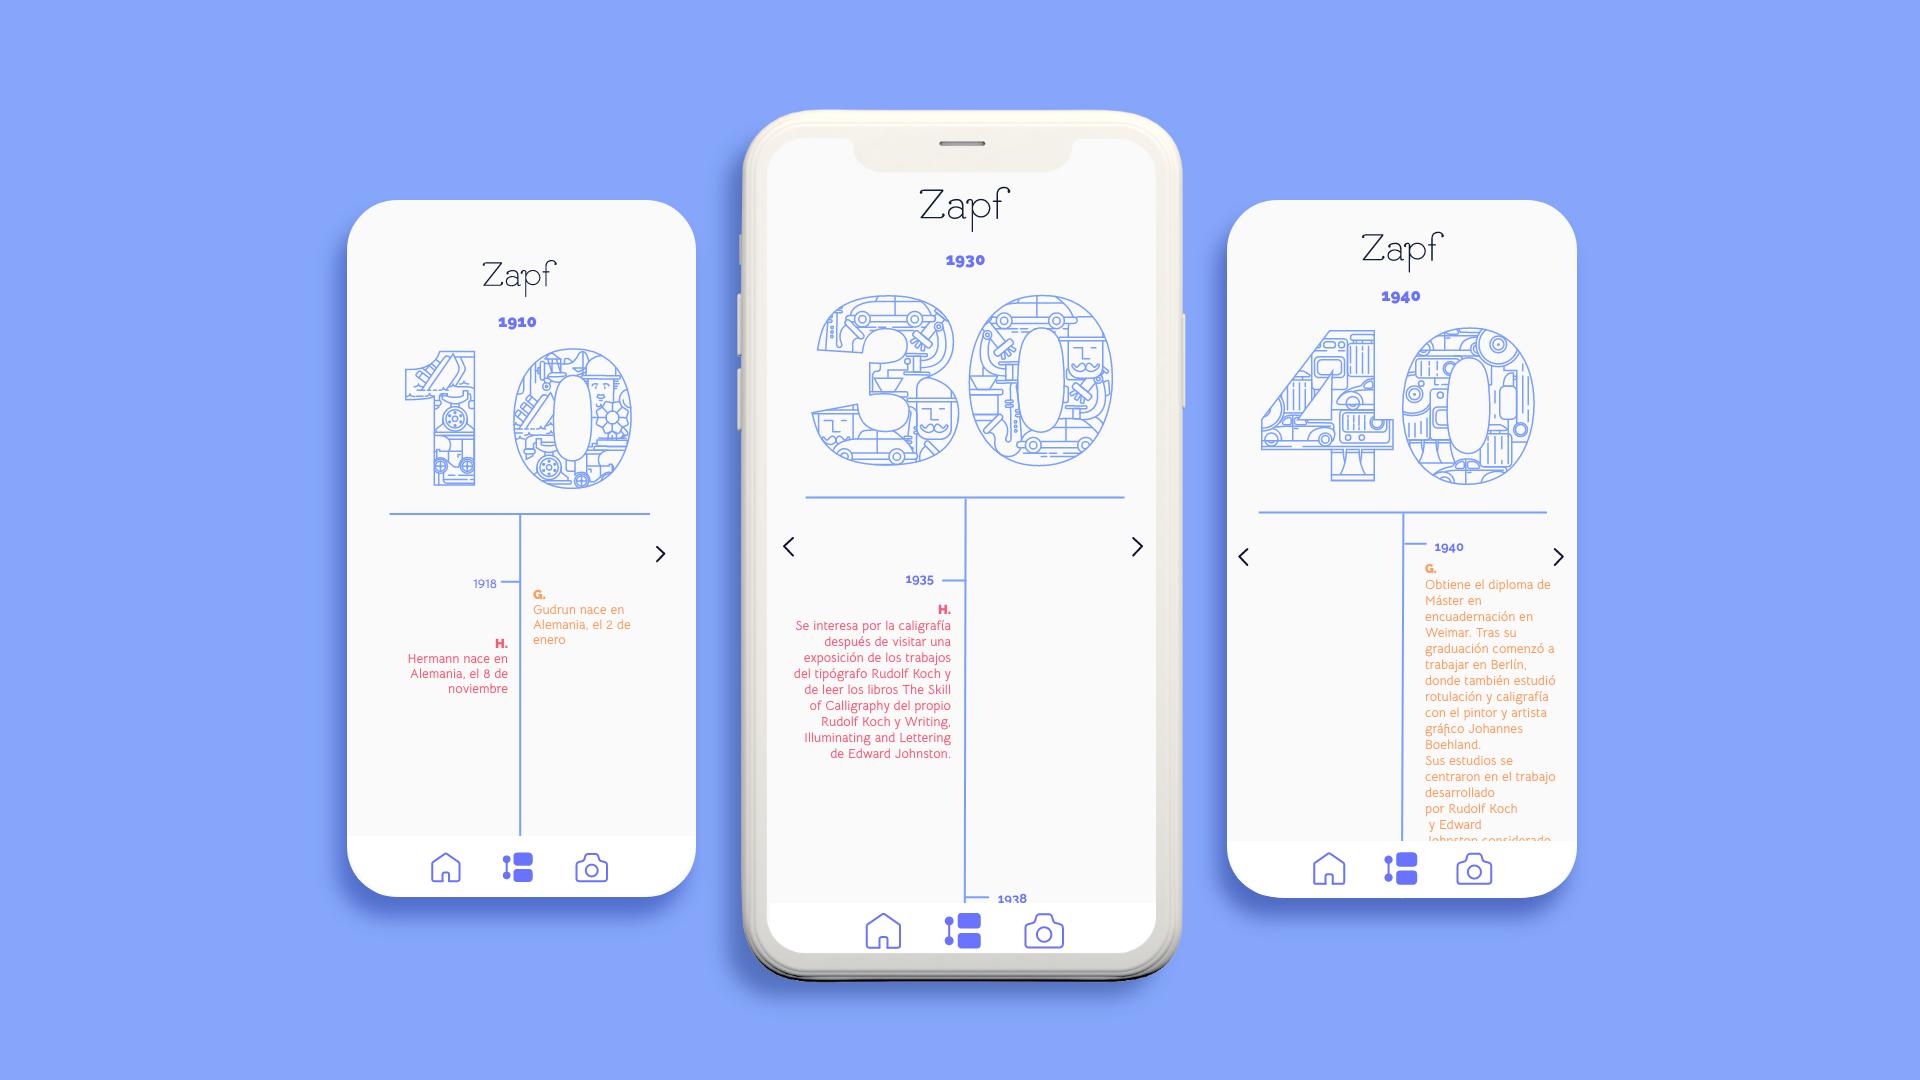 Los Zapf | Diseño UI/UX by Ana Alcubierre, Garbiñe Herreros, Maitane Bautista - Creative Work - $i